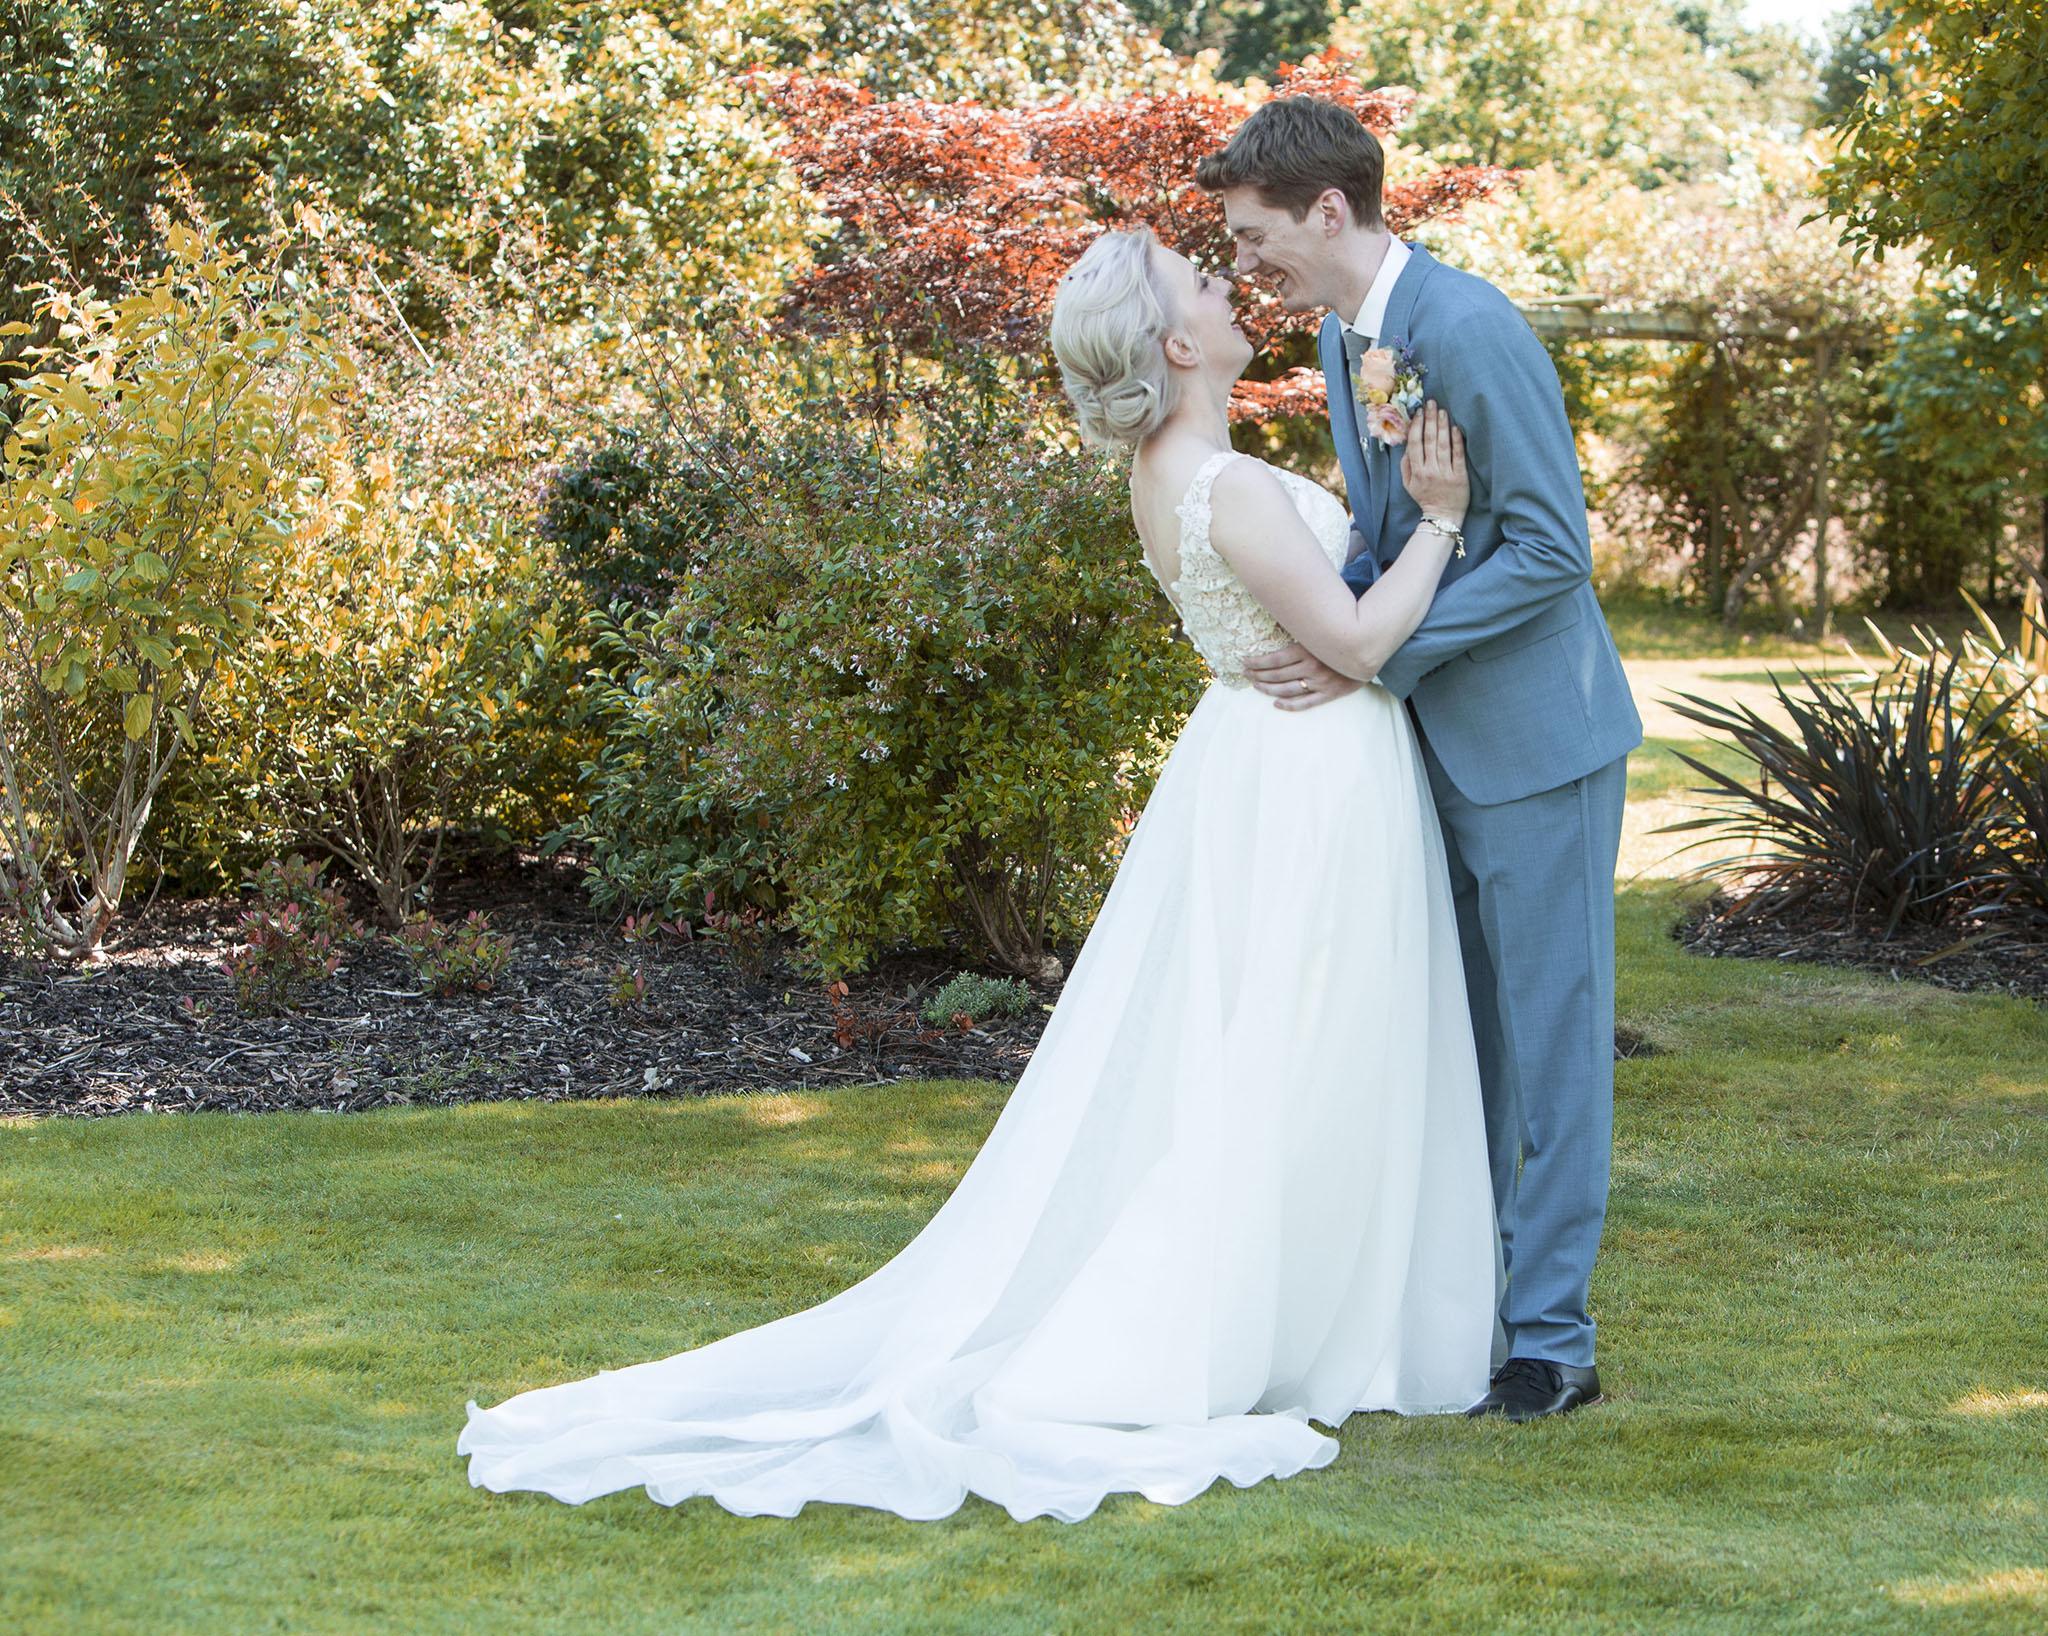 elizabethgphotography_kingslangley_hertfordshire_fineart_wedding_pottersbar_matt_katie_pegg_29.jpg